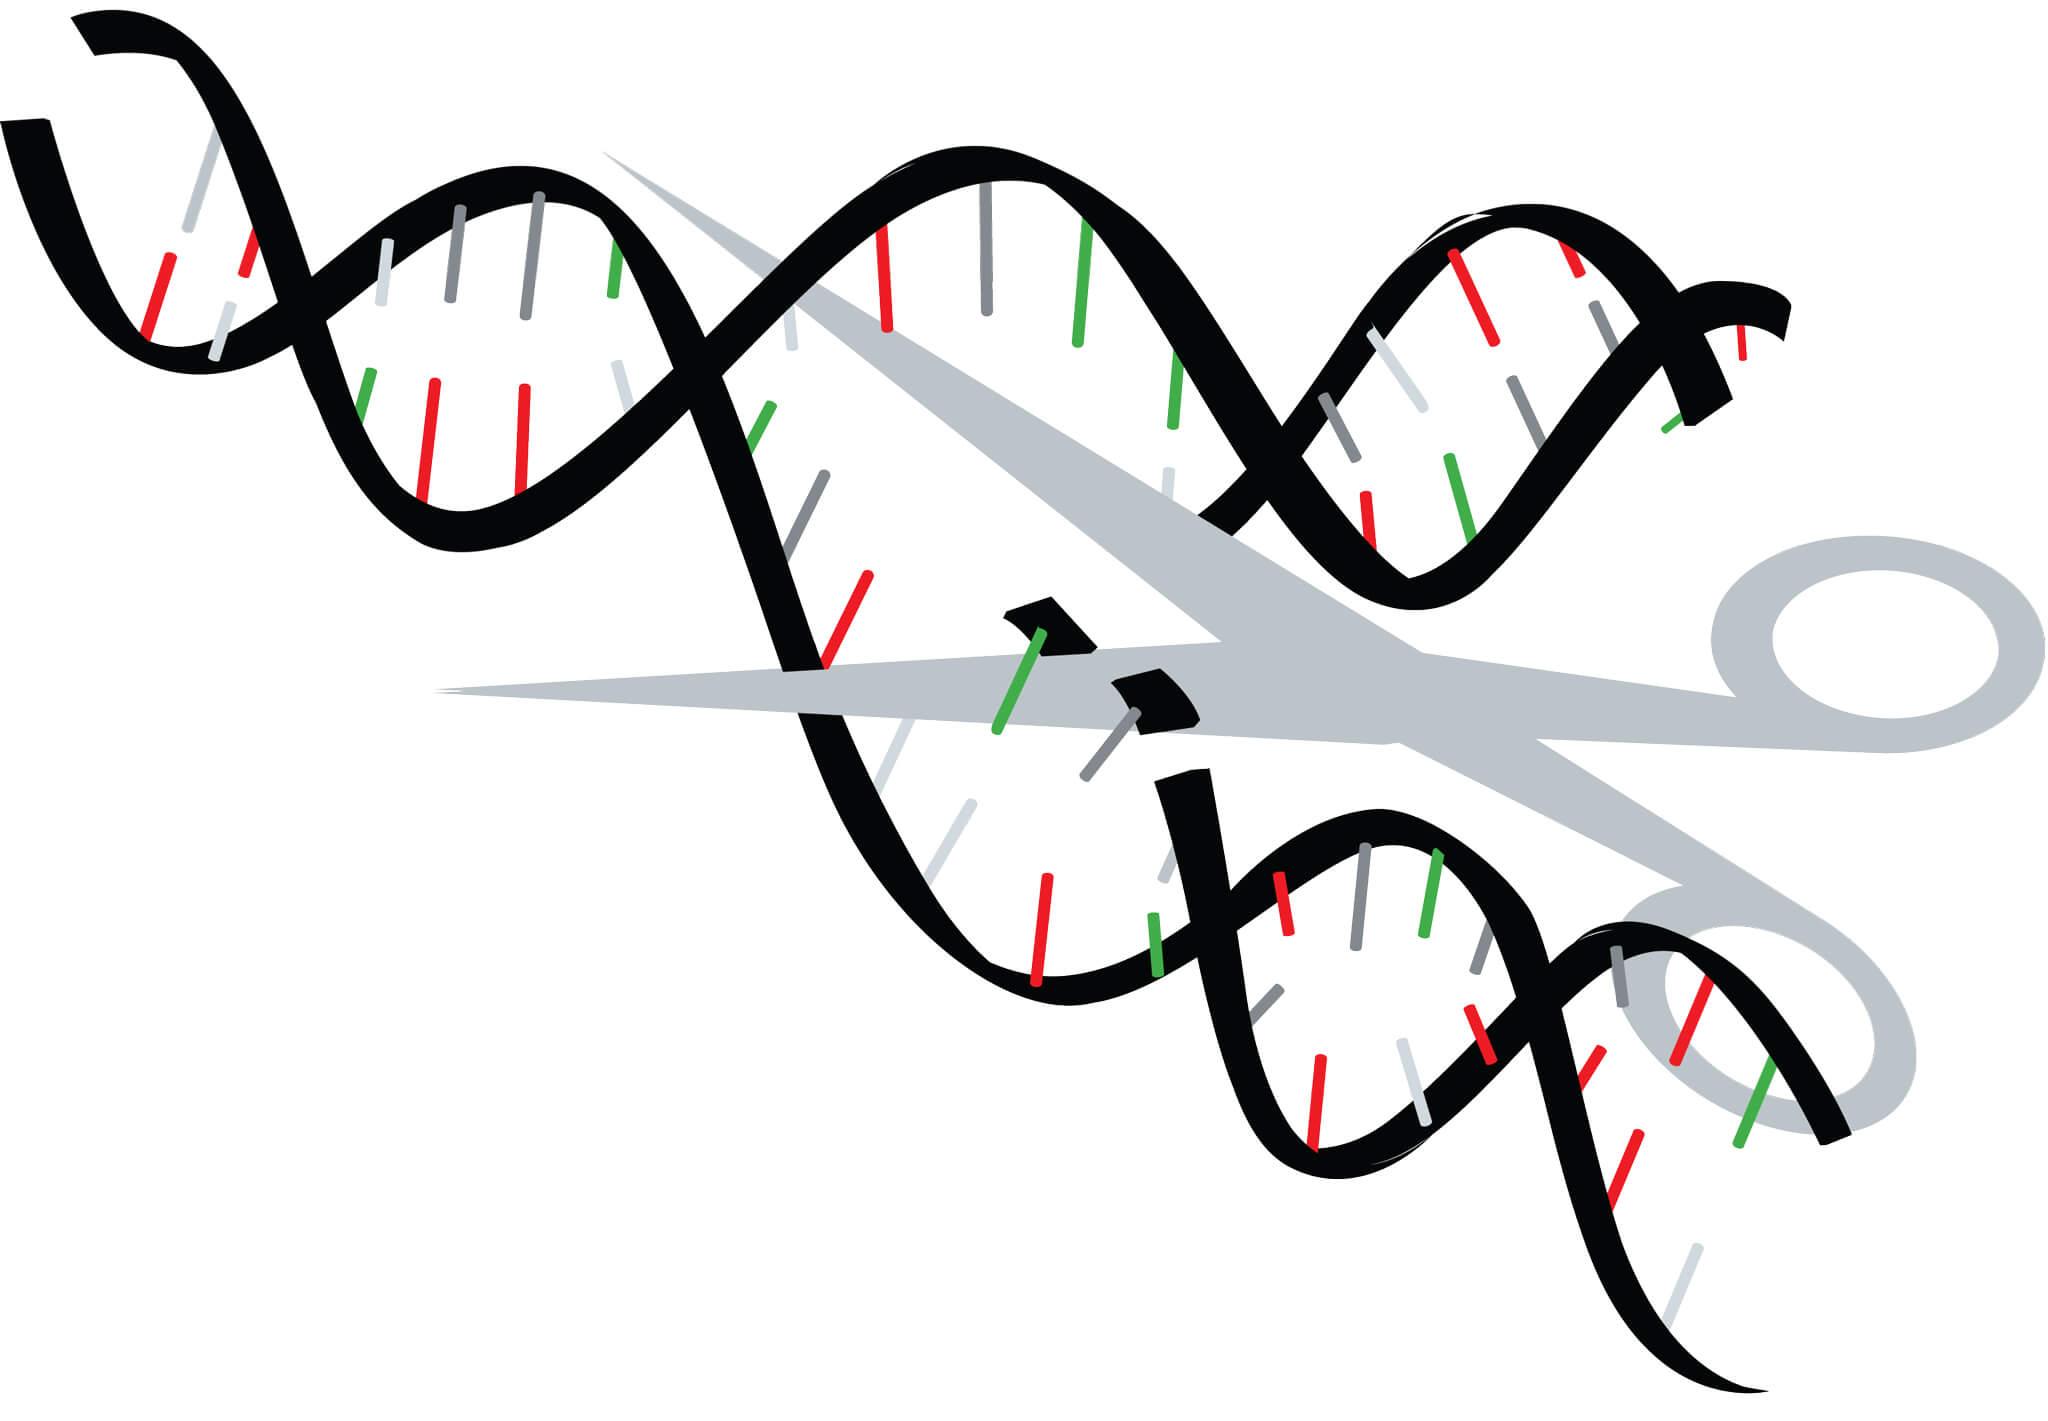 Gene editing could circumvent restrictive GMO regulations